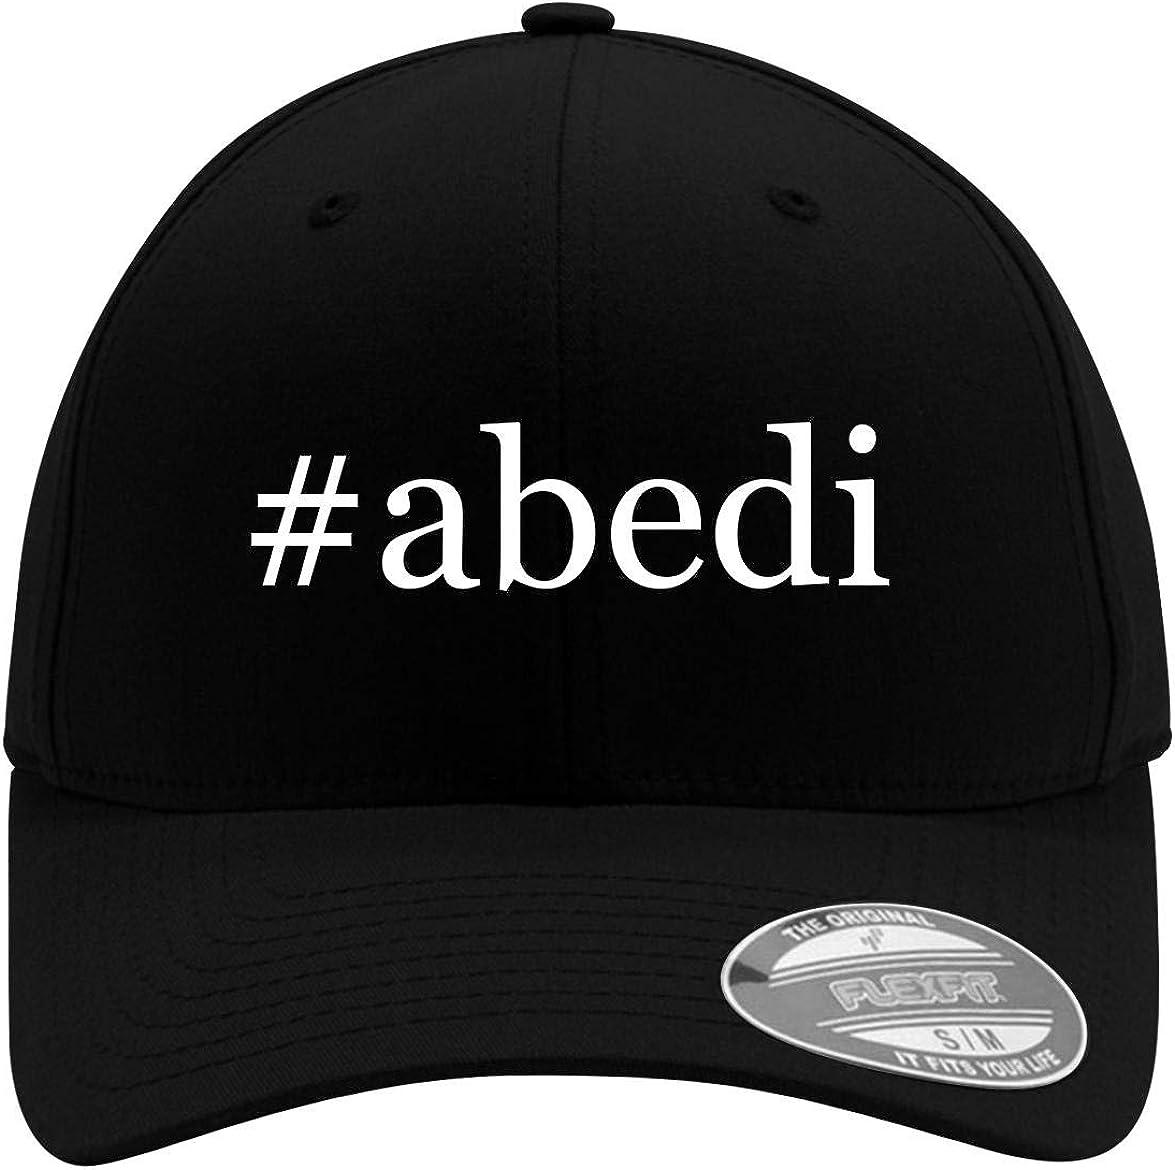 #abedi - Adult Men's Hashtag Flexfit Baseball Hat Cap 61FuWGBRE8L